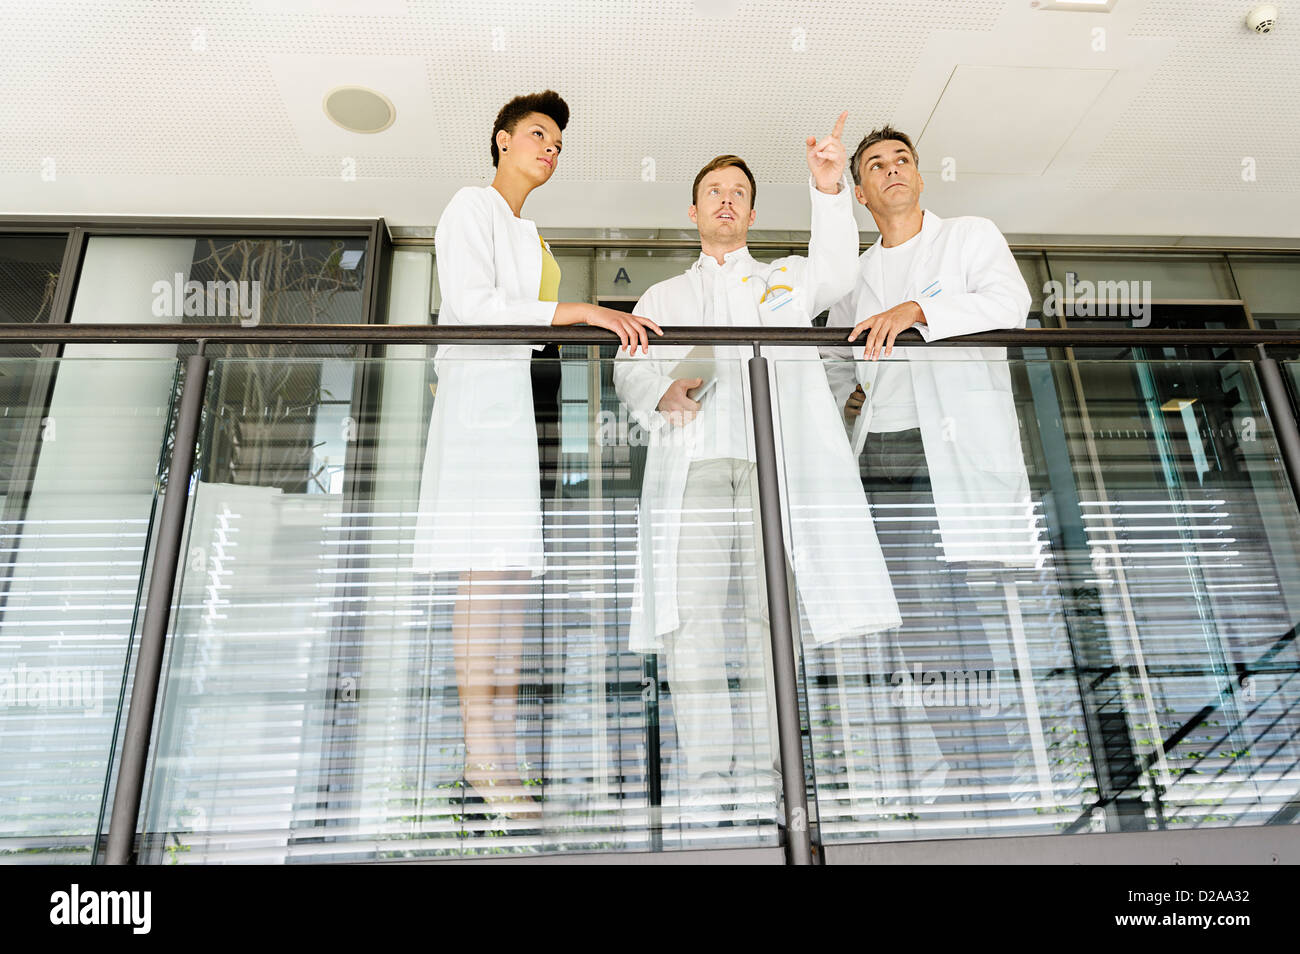 Doctors talking on balcony in hospital - Stock Image